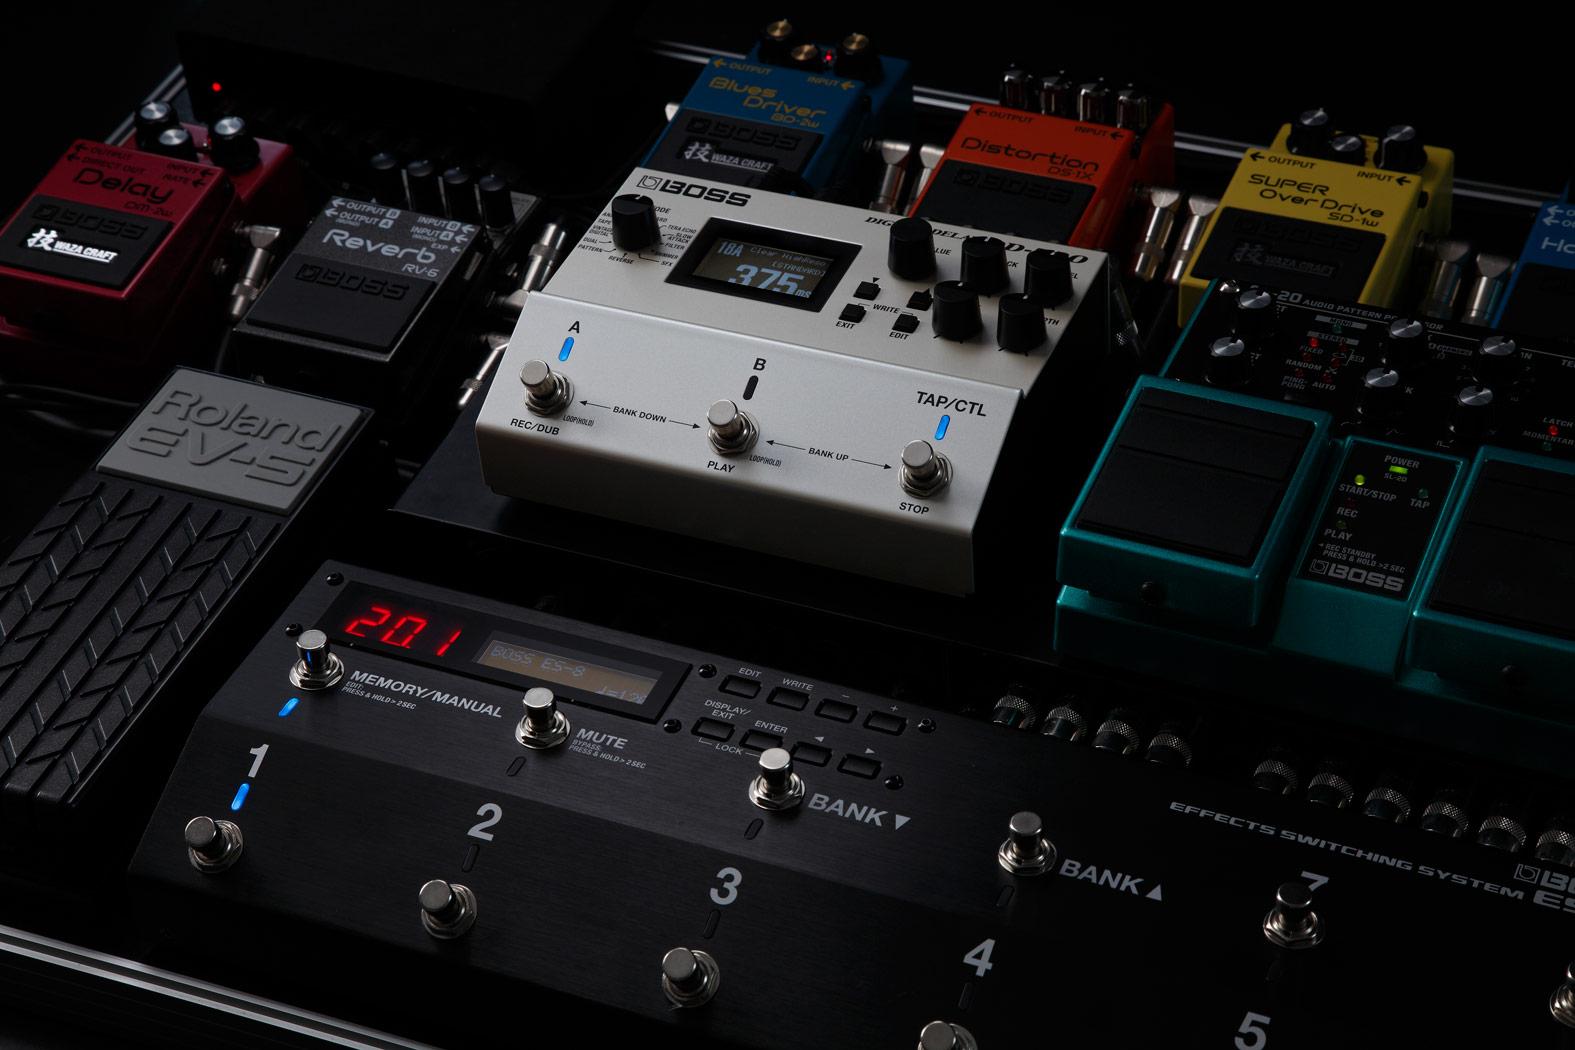 Boss India Dd 500 Digital Delay Circuits Gt 2 Guitar Pedal Schematic Diagram